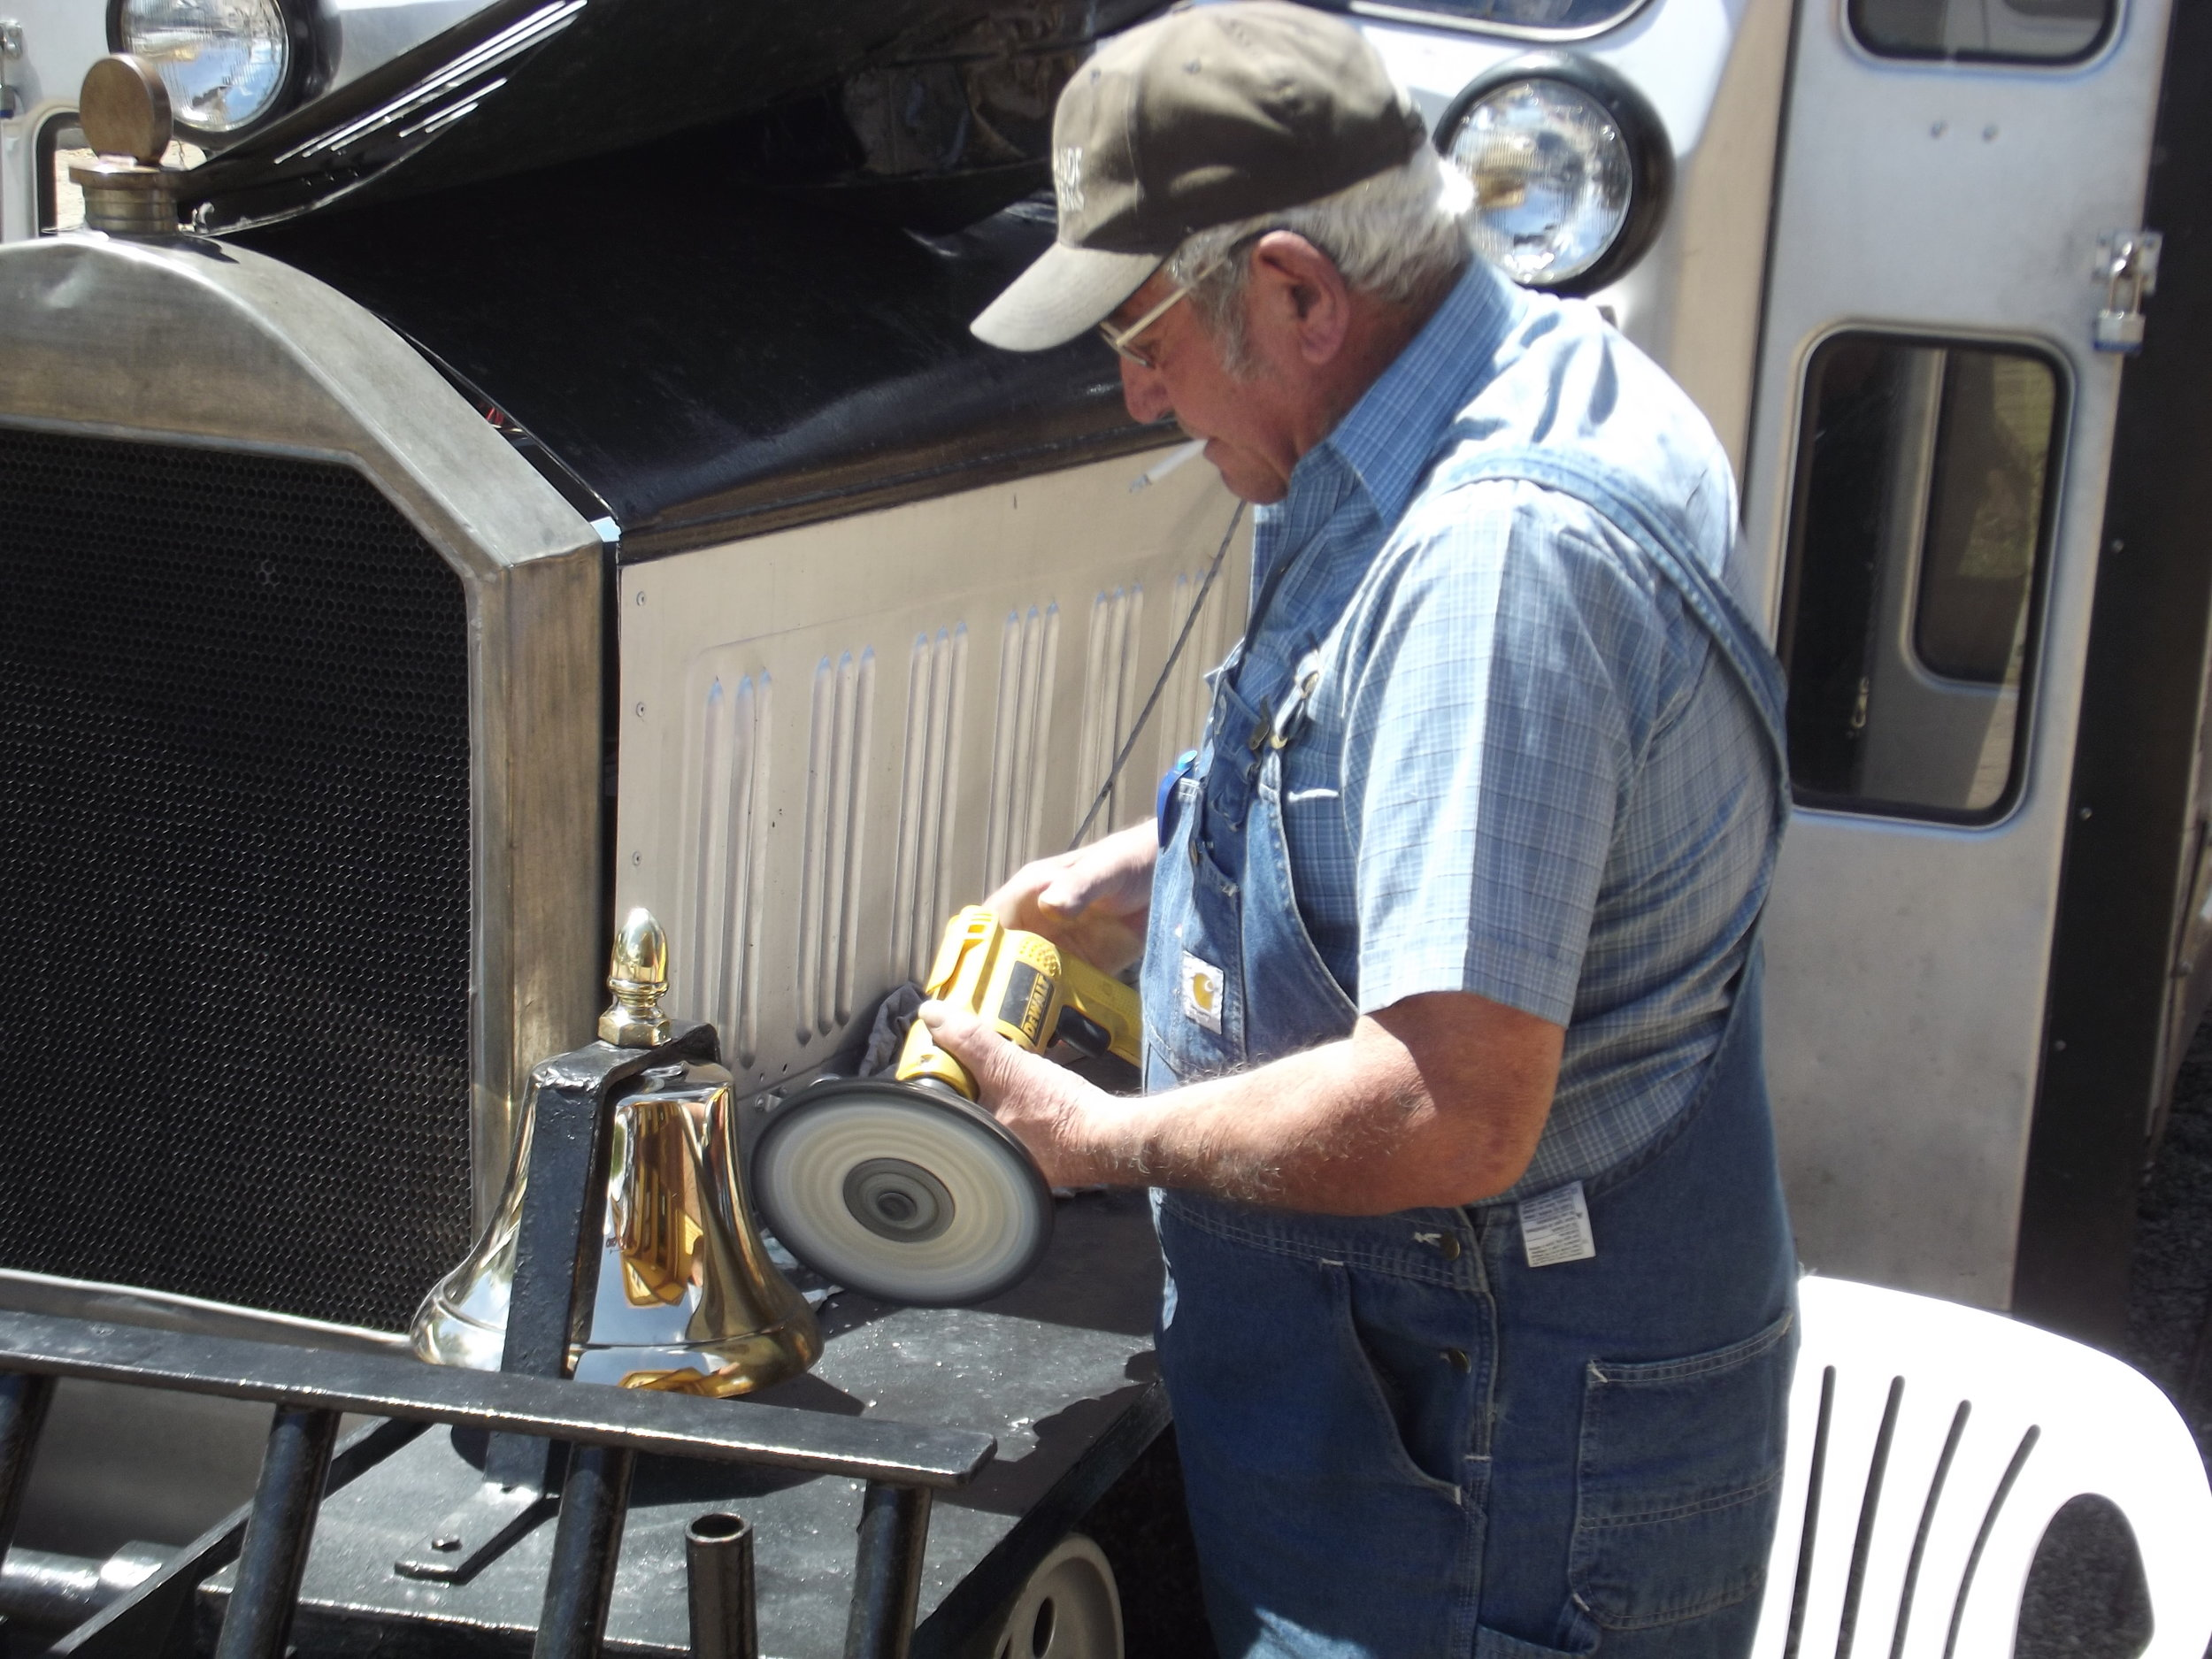 Polishing bell before Railfest, 2011